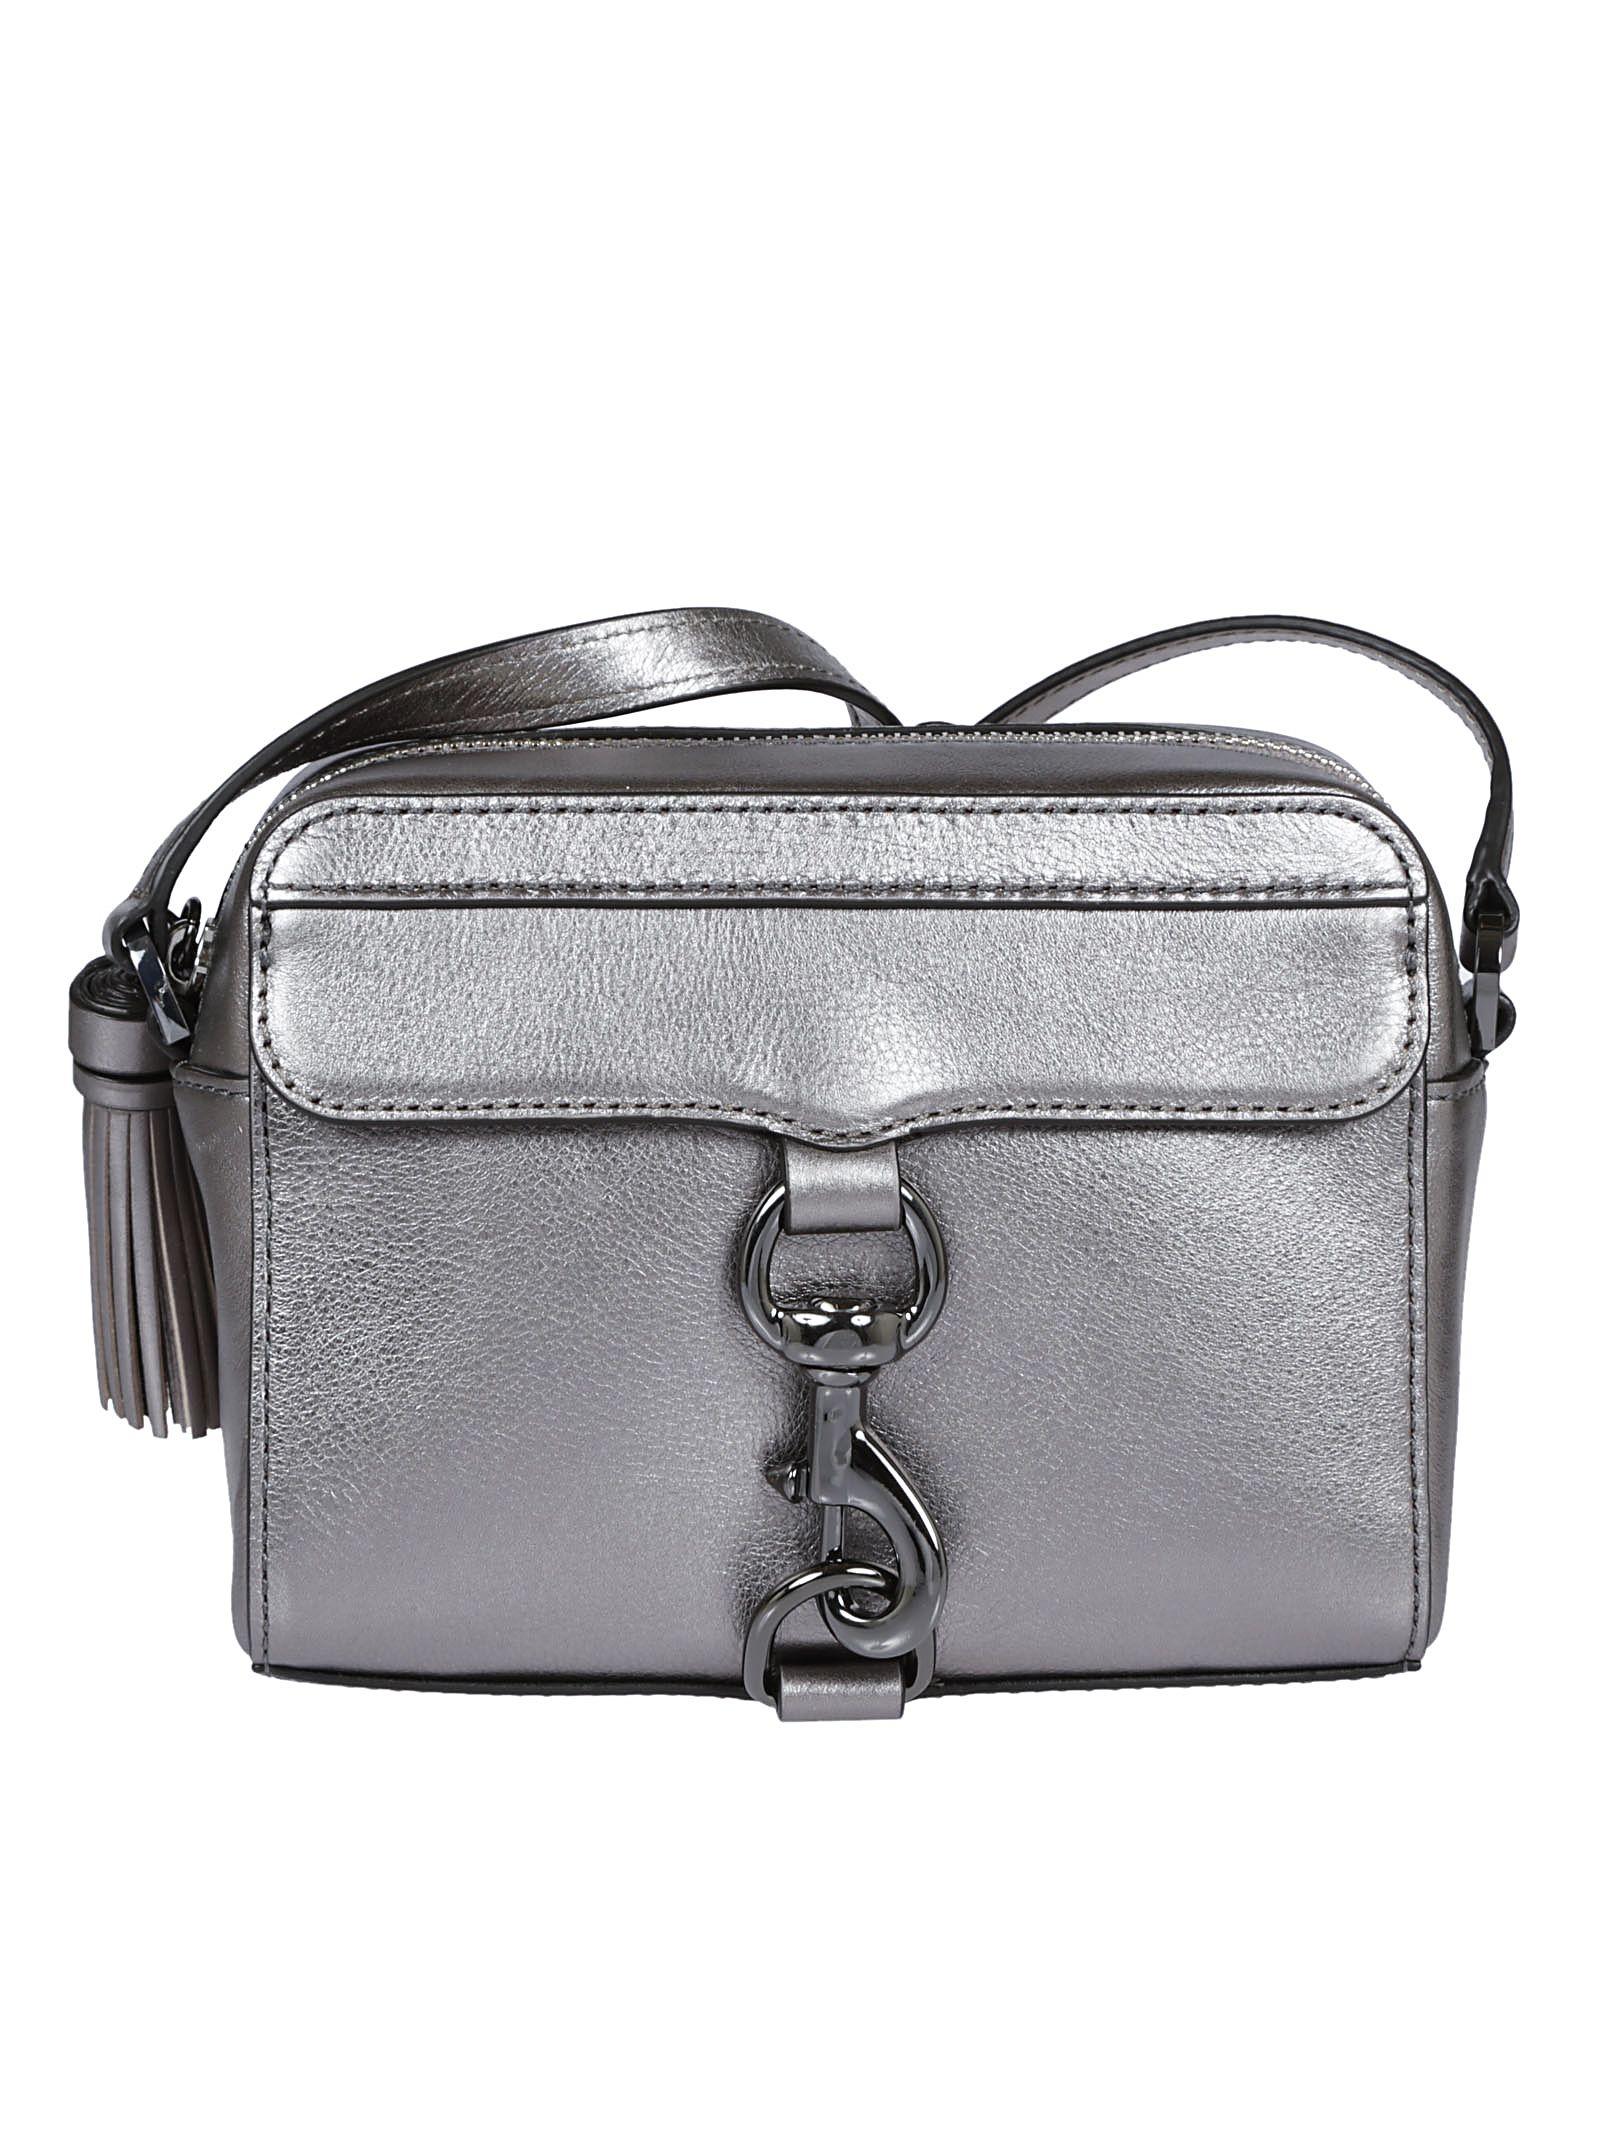 Rebecca Minkoff Metallic Shoulder Bag